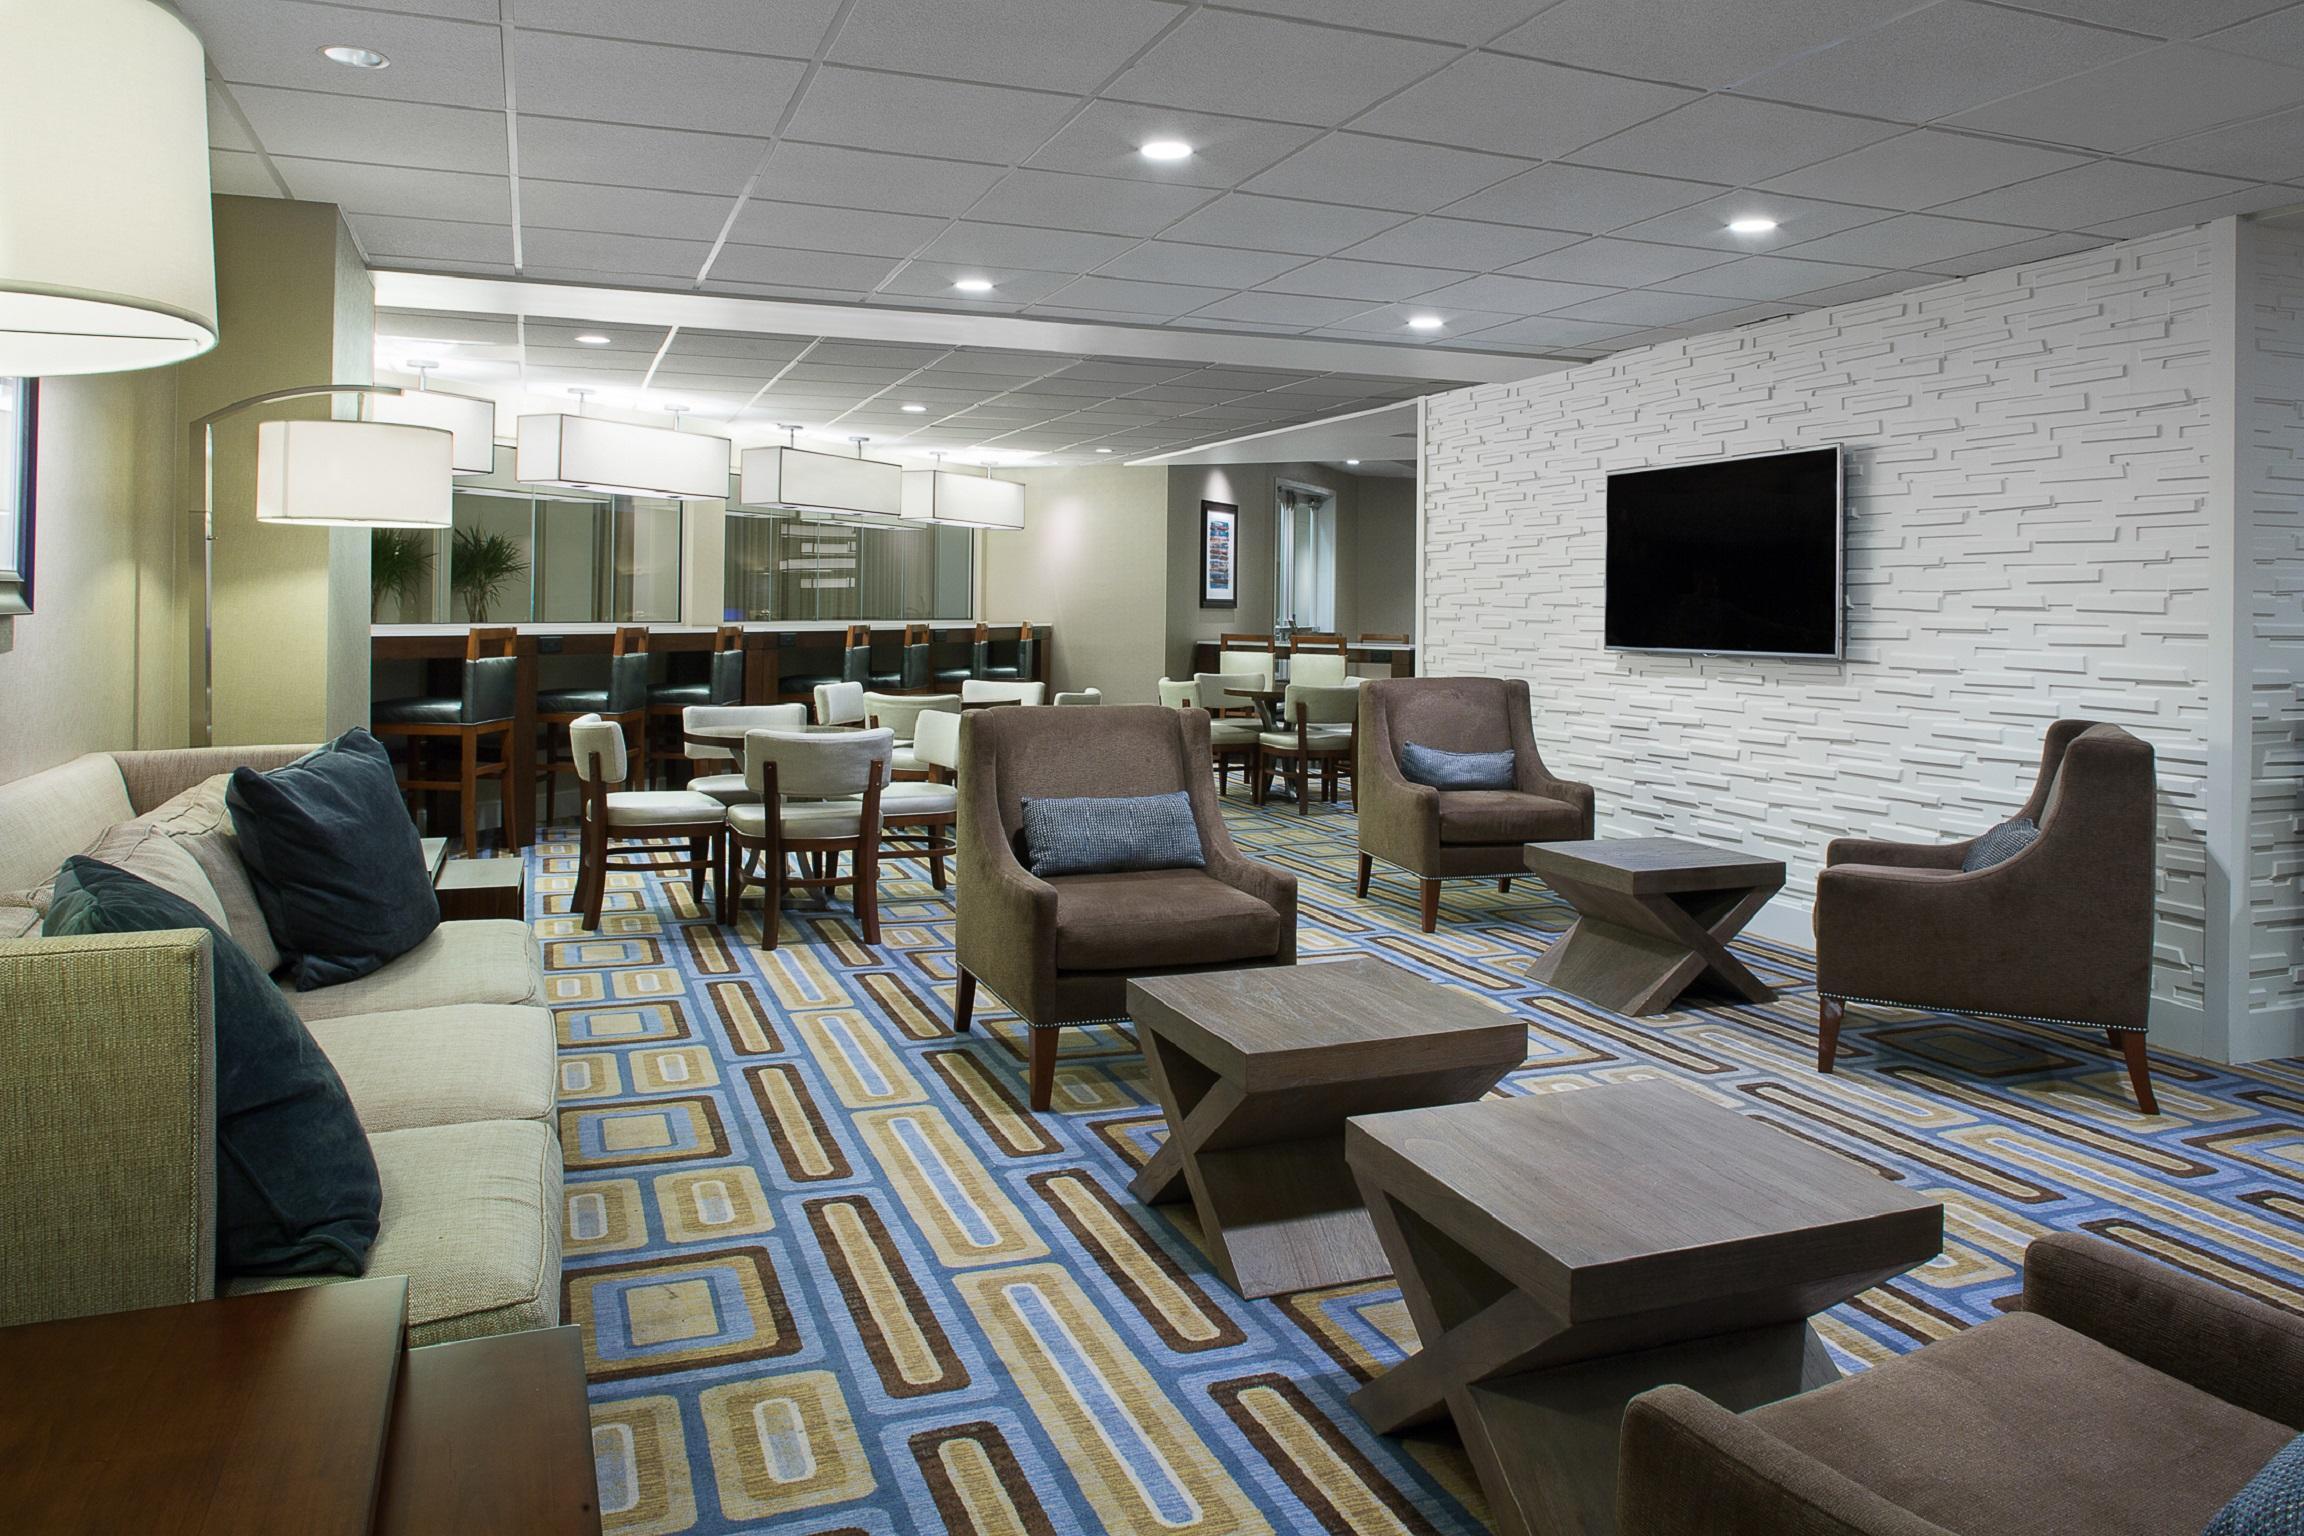 Hilton Crystal City At Washington Reagan National Airport Arlington Va Company Information